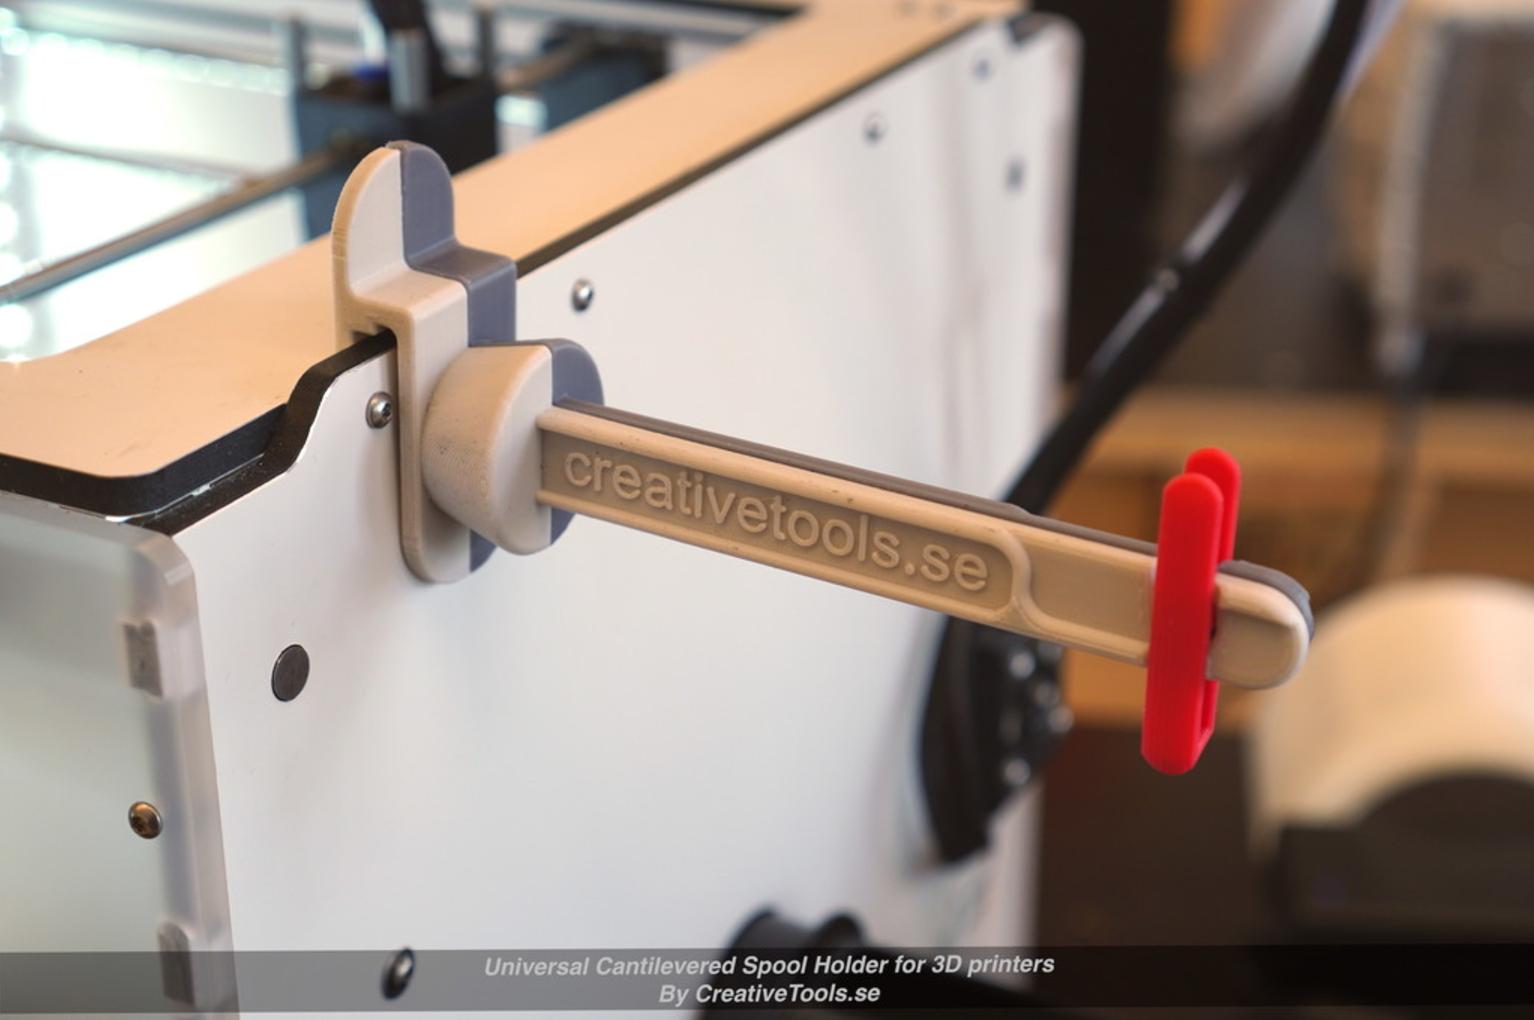 Capture d'écran 2017-05-09 à 09.44.52.png Download free STL file Universal Cantilevered Spool Holder for 3D printers • 3D printing design, CreativeTools